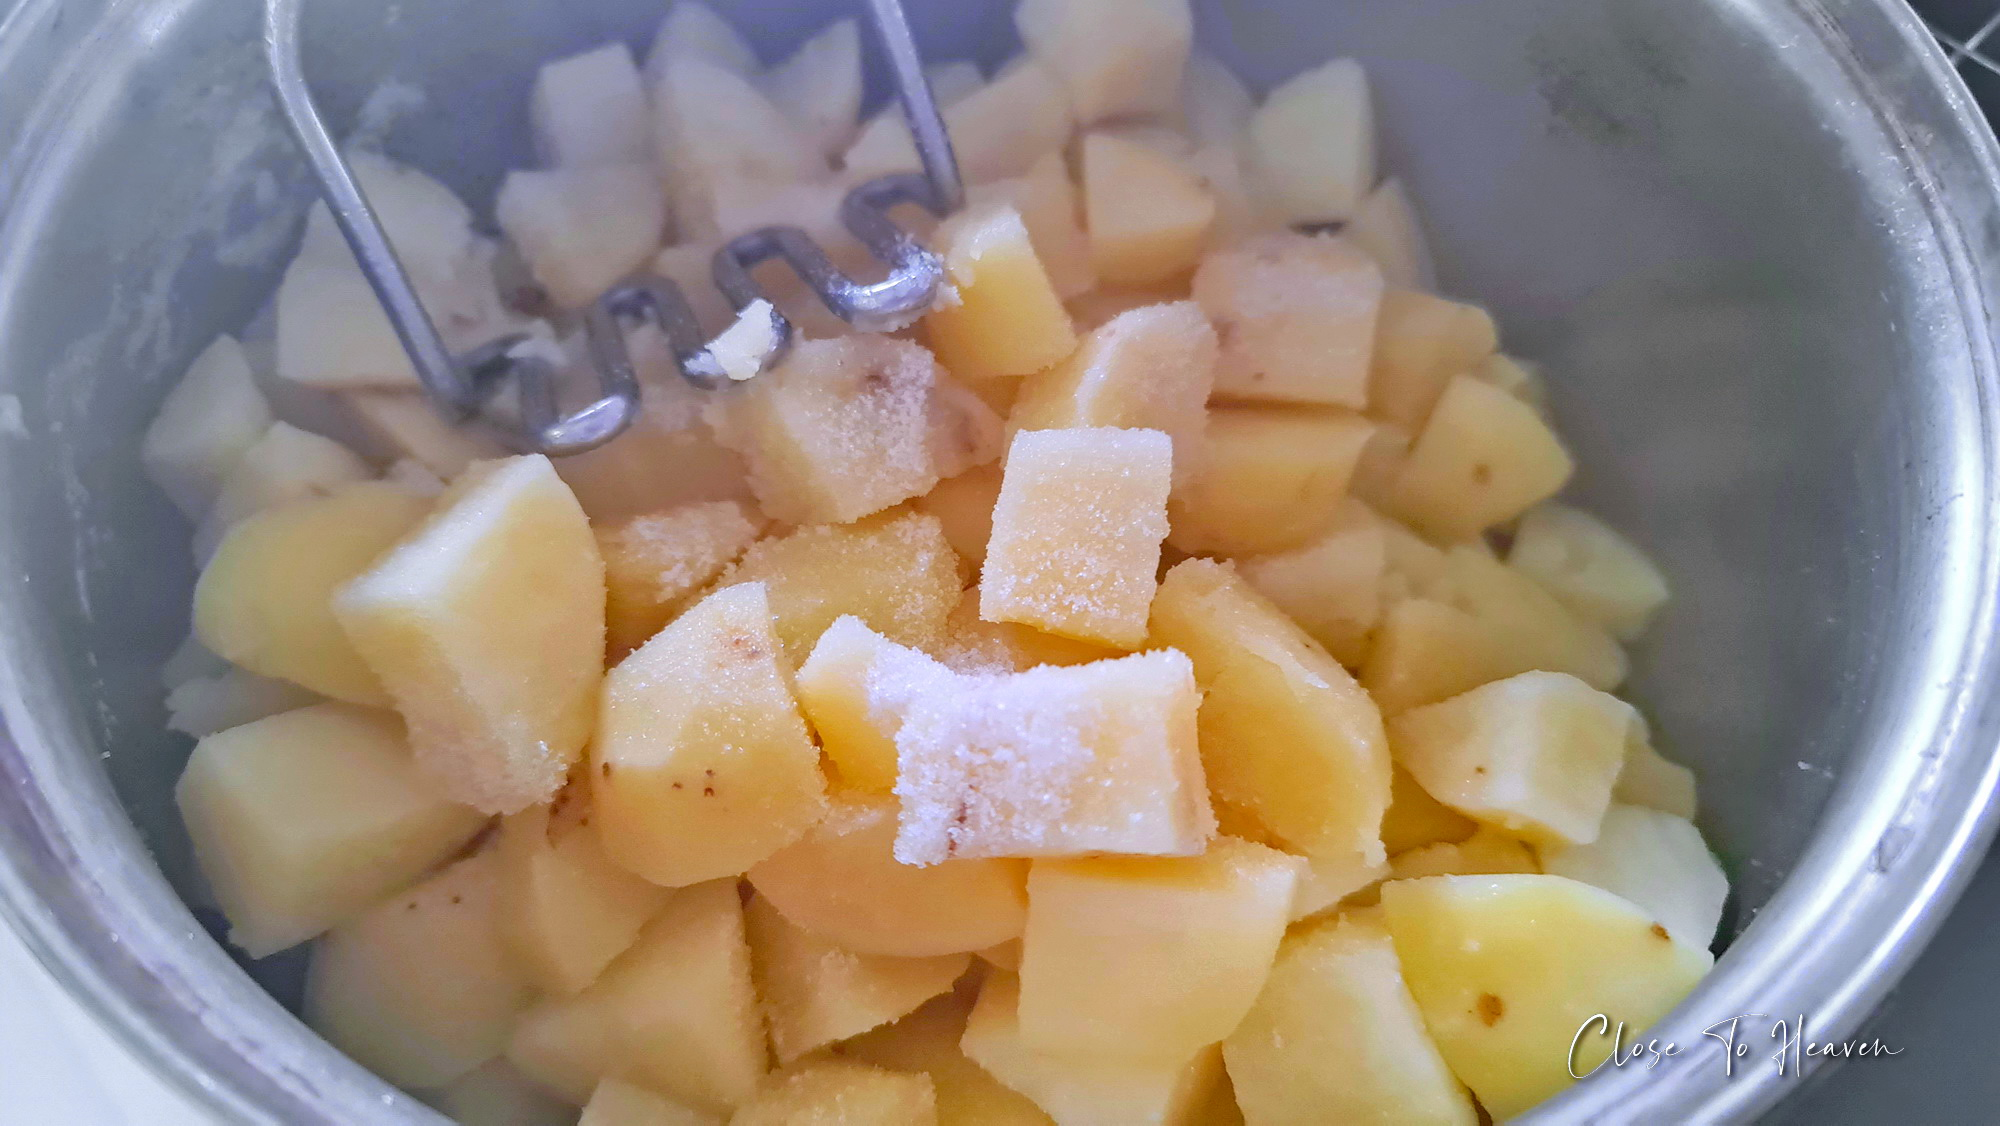 Mashed potatoes มันบด ทำเองก็ได้ ง่ายจัง